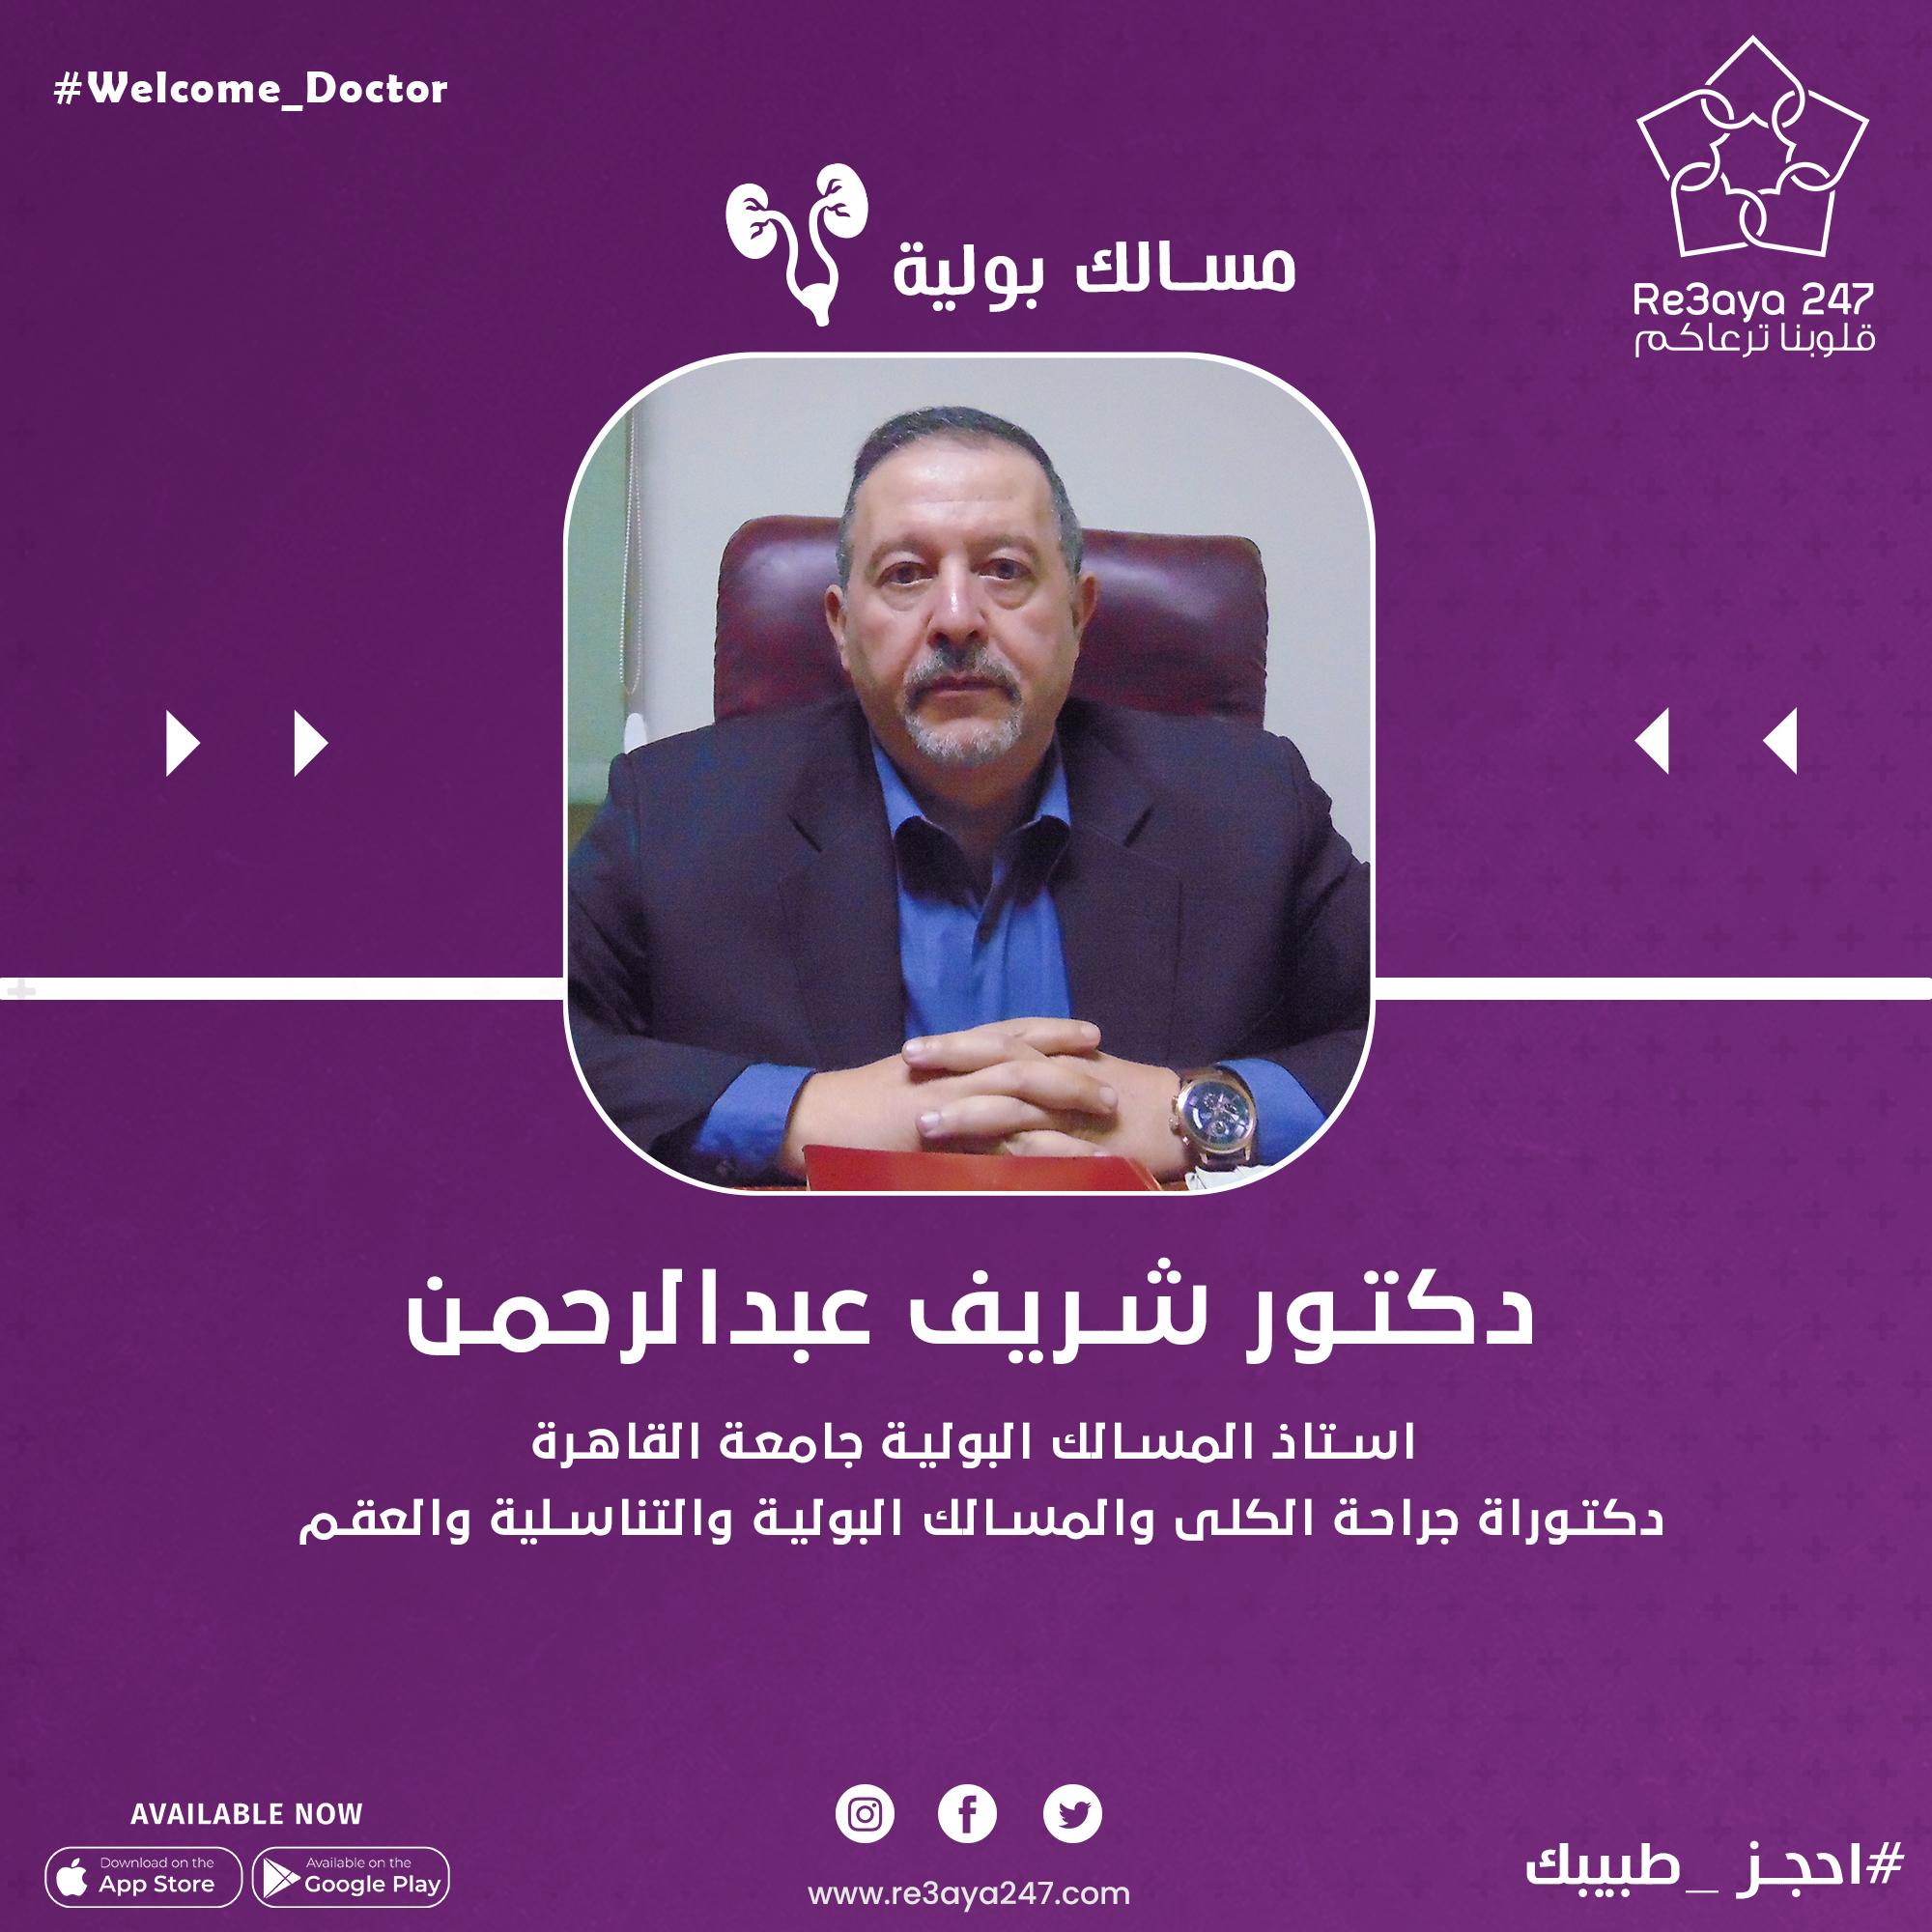 احجز مع د/شريف عبدالرحمن